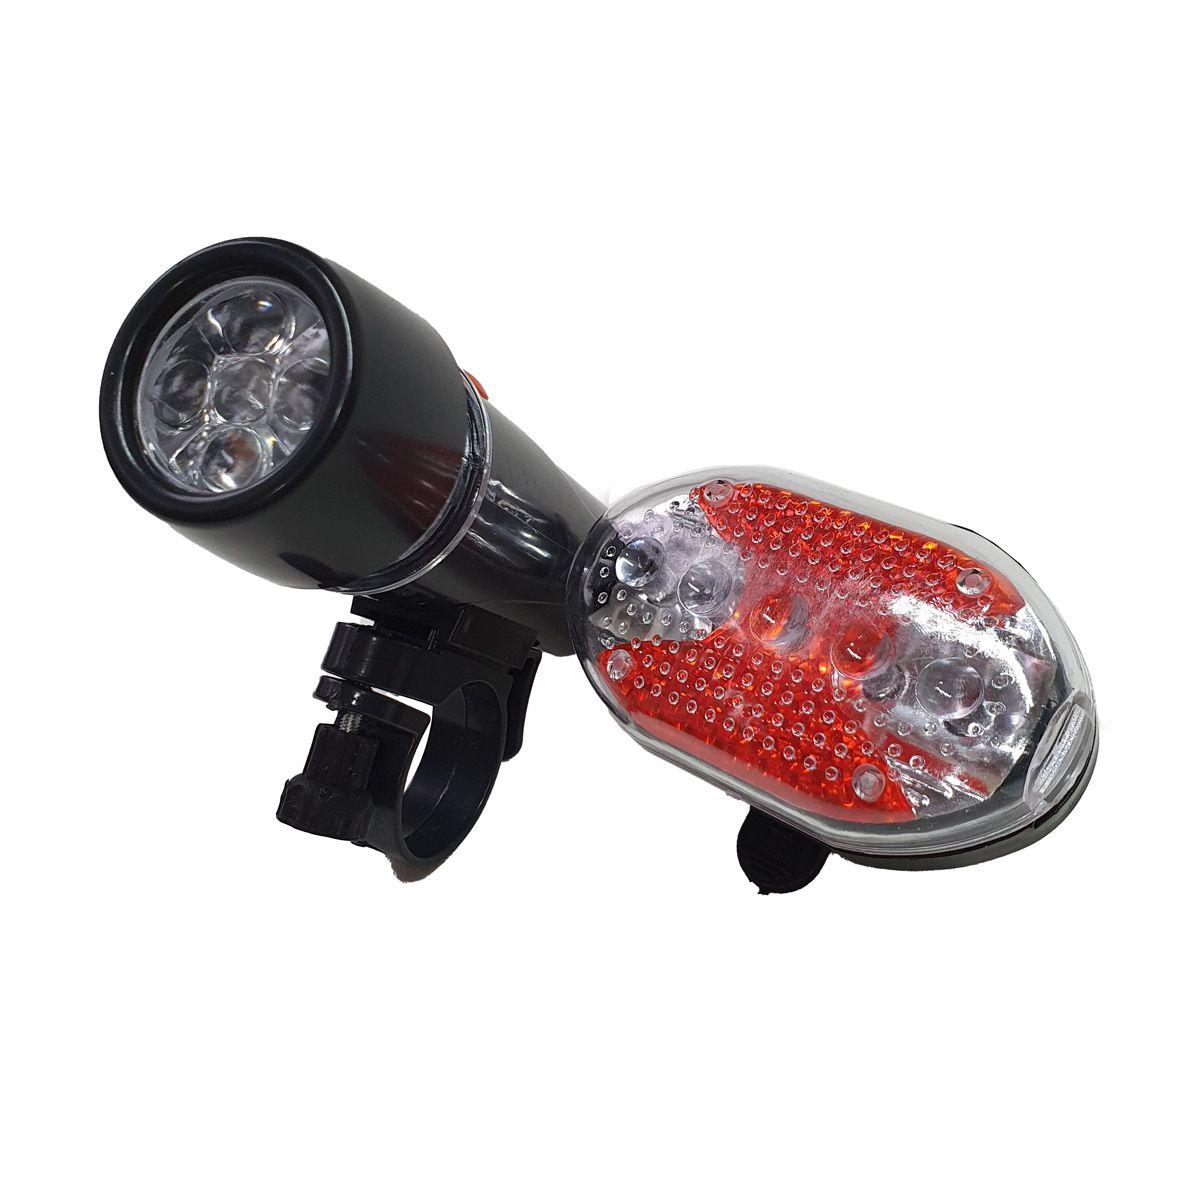 Kit de Segurança para Bicicleta com Farol e Lanterna LK-048 LuaTek